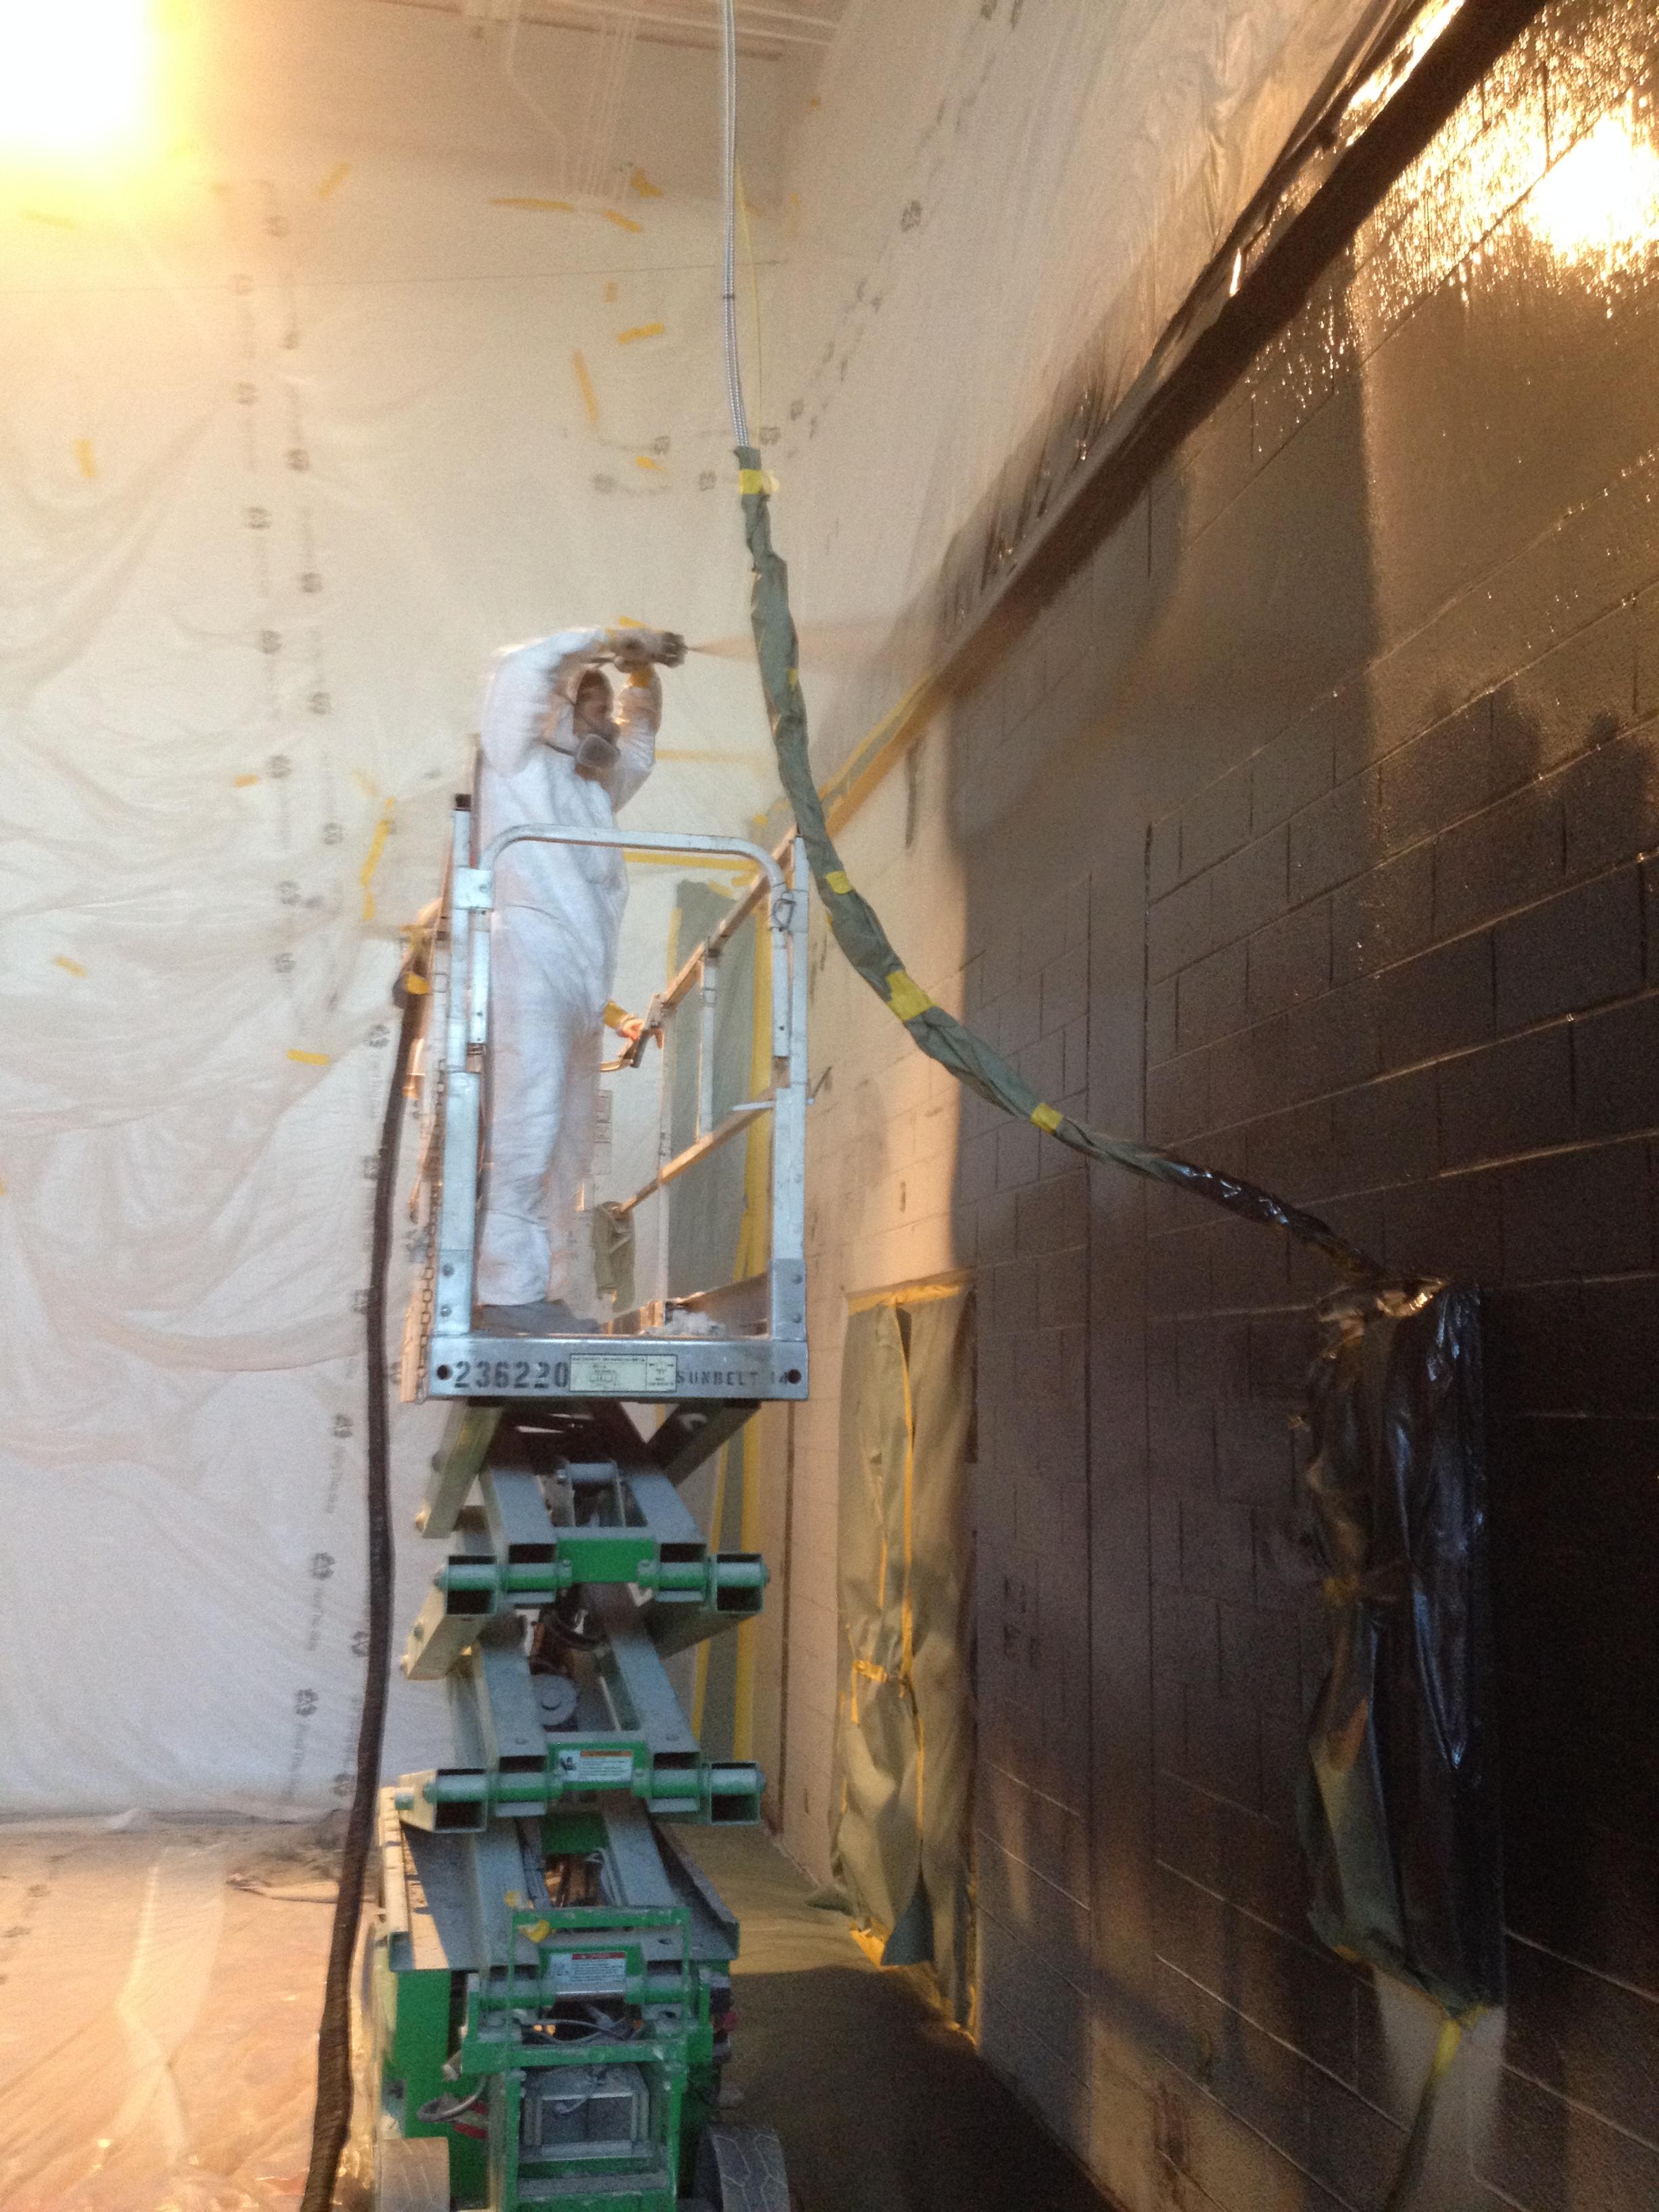 Polyurea | Polyurea Coating Experts - Hotspray Industrial Coatings